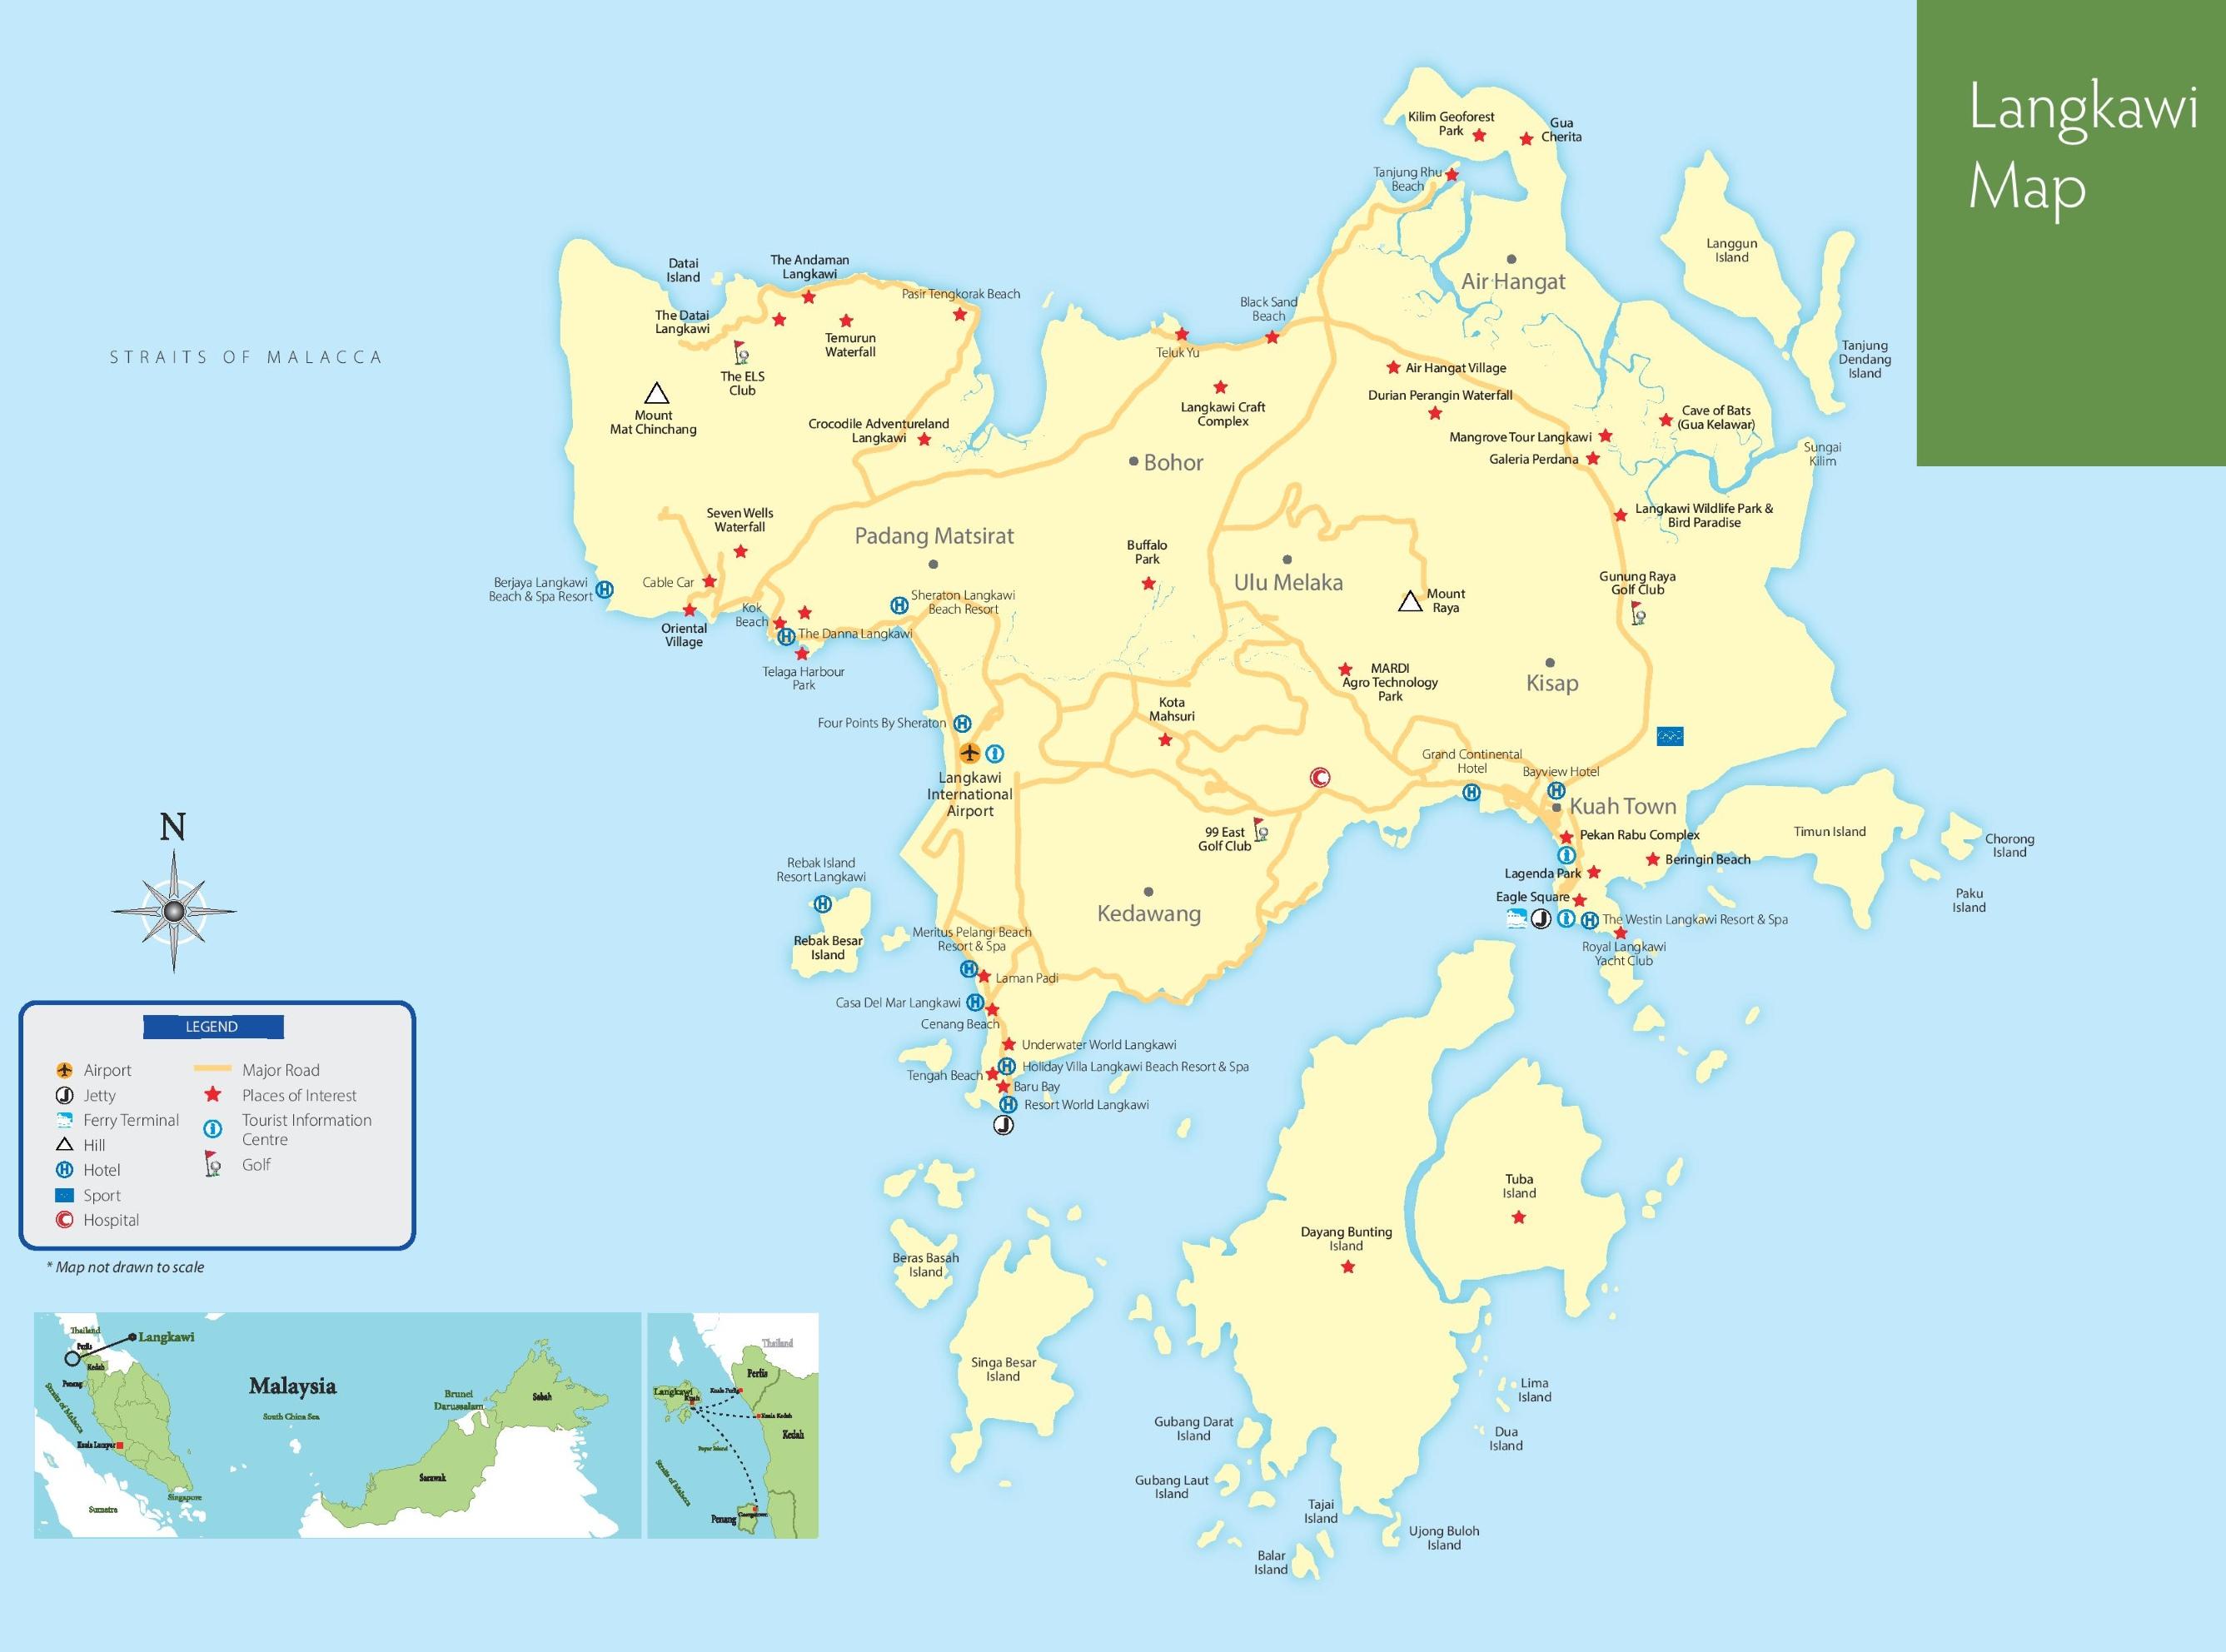 Map Of Malaysia And Langkawi Langkawi Maps | Malaysia | Maps of Langkawi Island